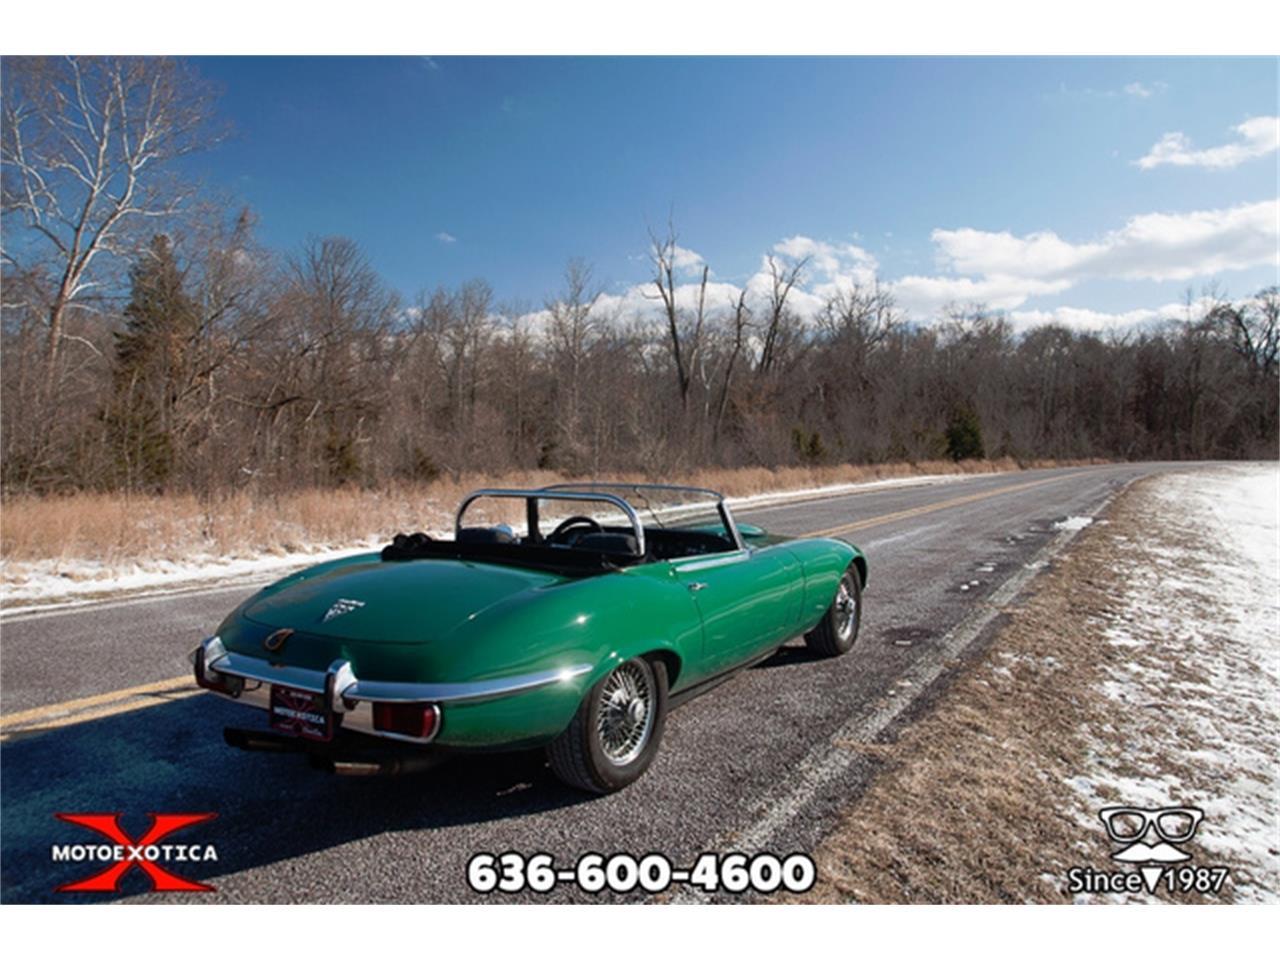 Large Picture of '71 Jaguar E-Type located in Missouri - $36,900.00 - QXK8